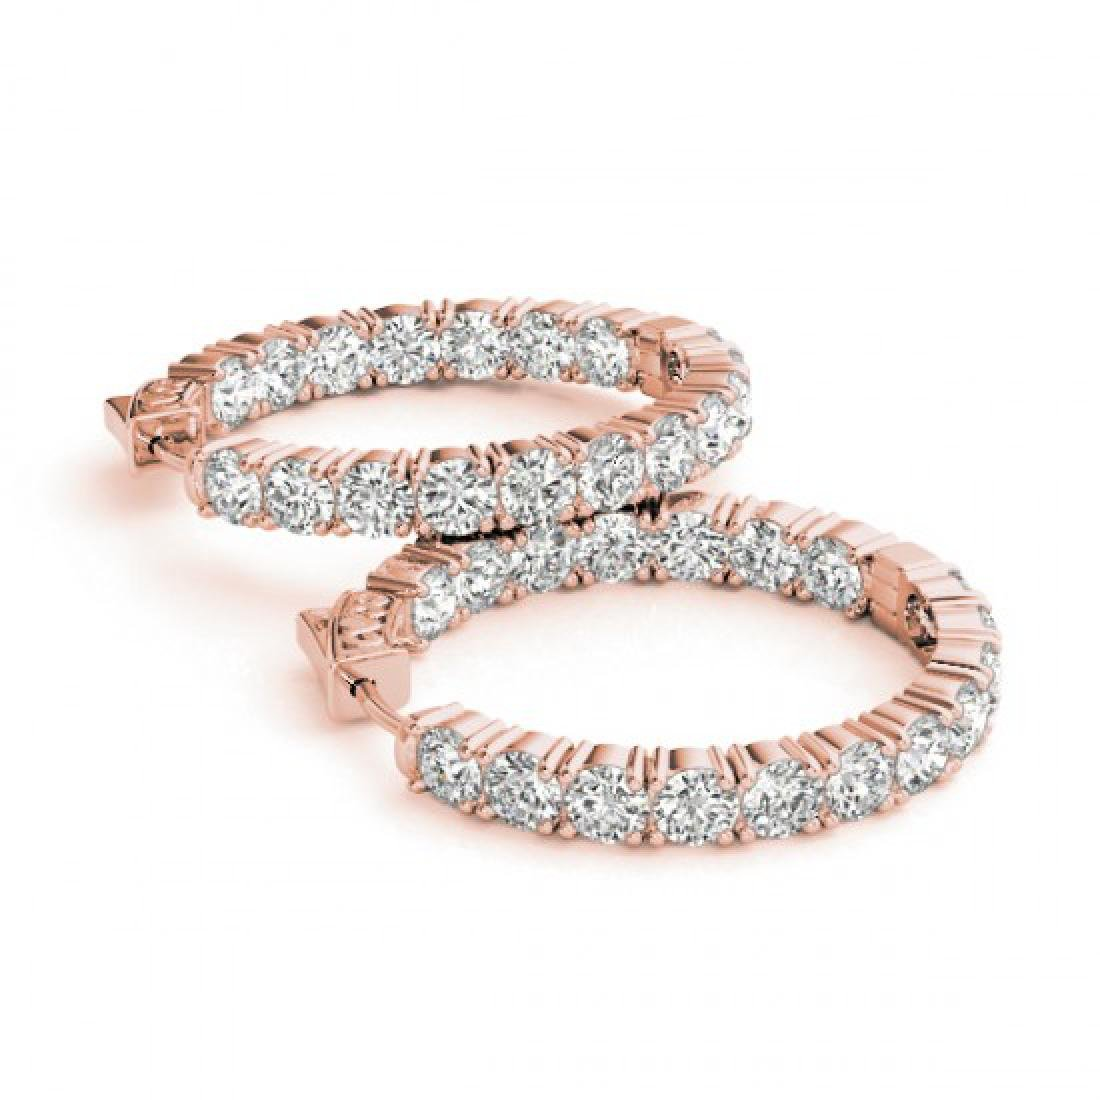 5 CTW Diamond VS/SI Certified 21 Mm Hoop Earrings 14K